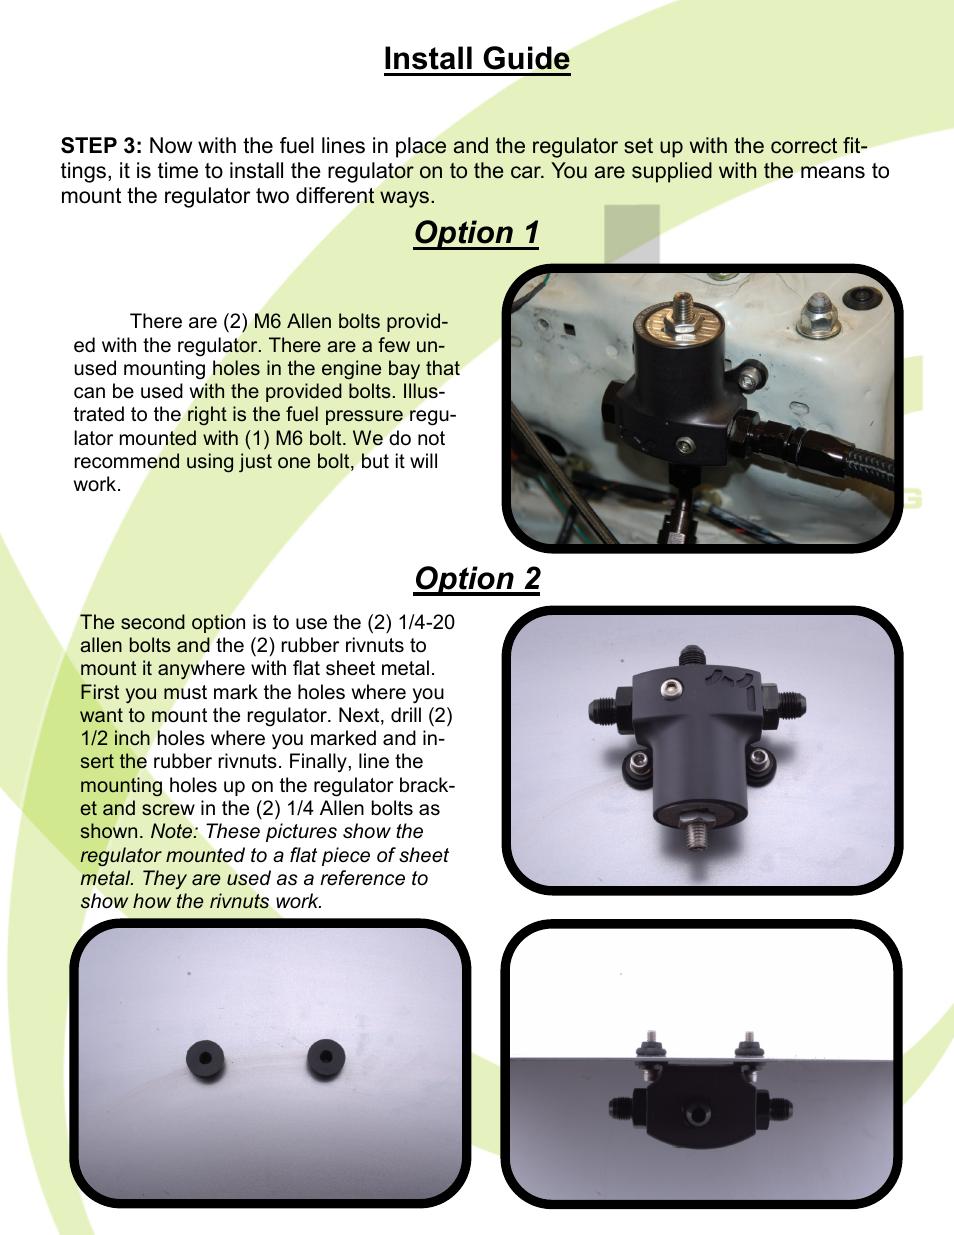 Install Guide Option 1 2 Hybrid Racing Hr Unibody Fuel Pressure Regulator User Manual Page 5 7